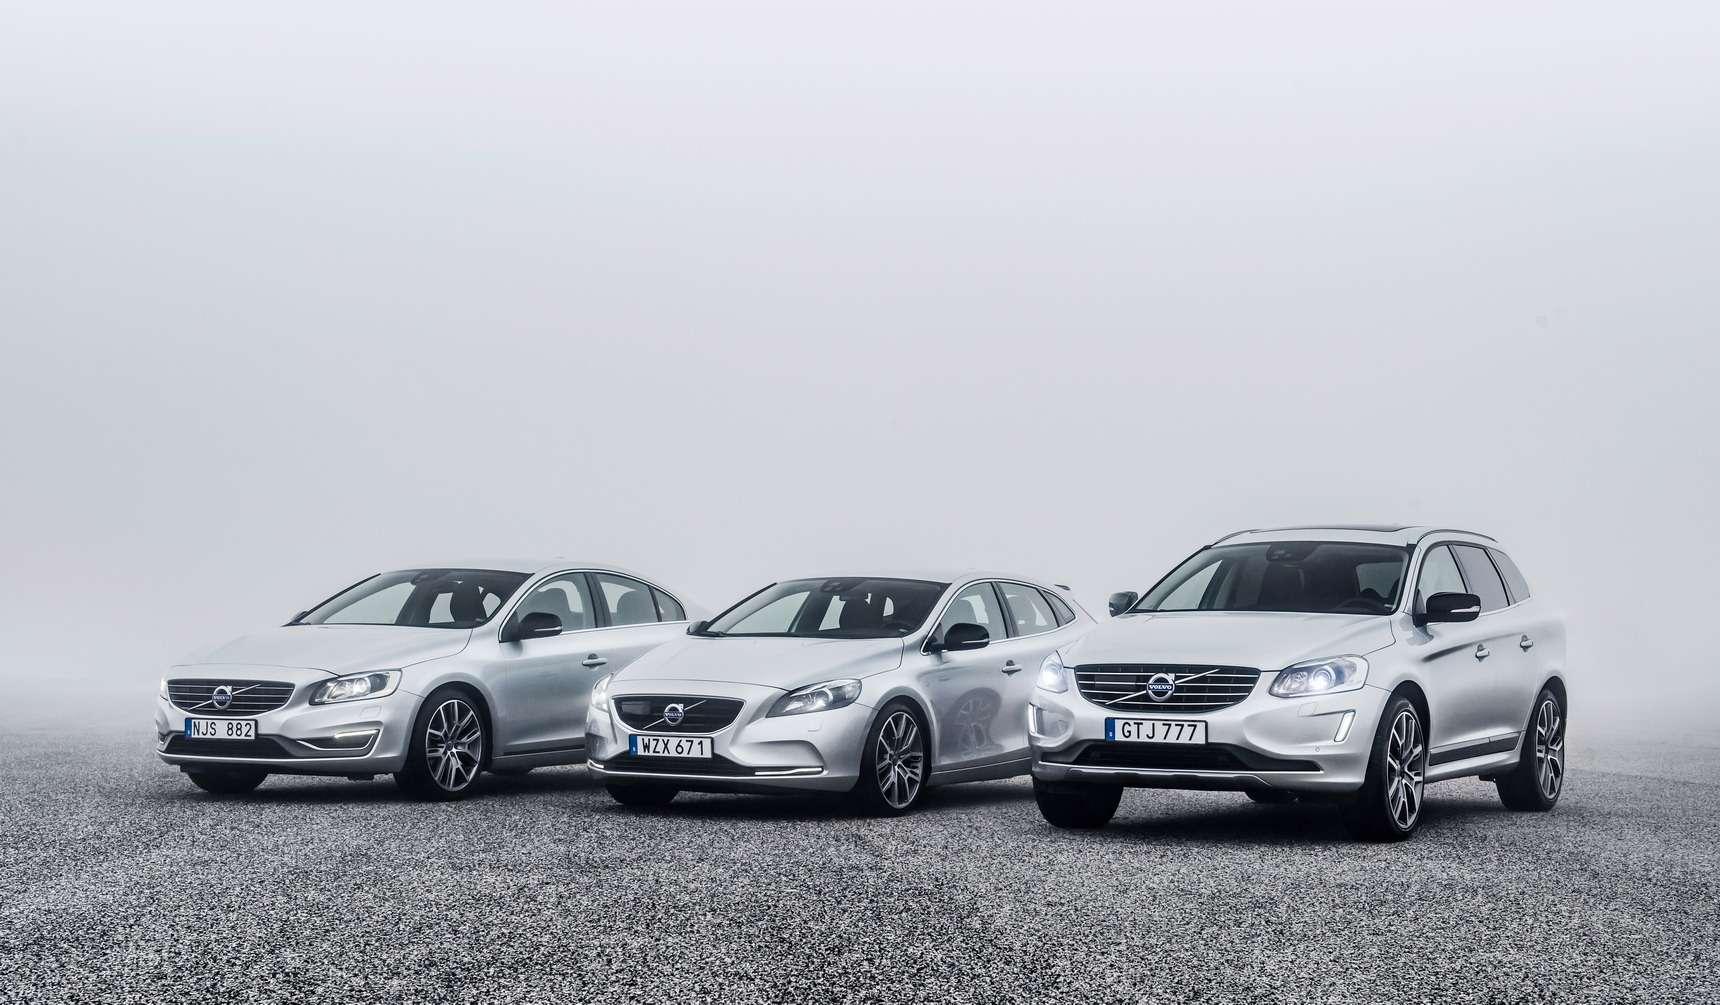 Volvo соспециями: дегустируем спортпакет Polestar— фото 586984